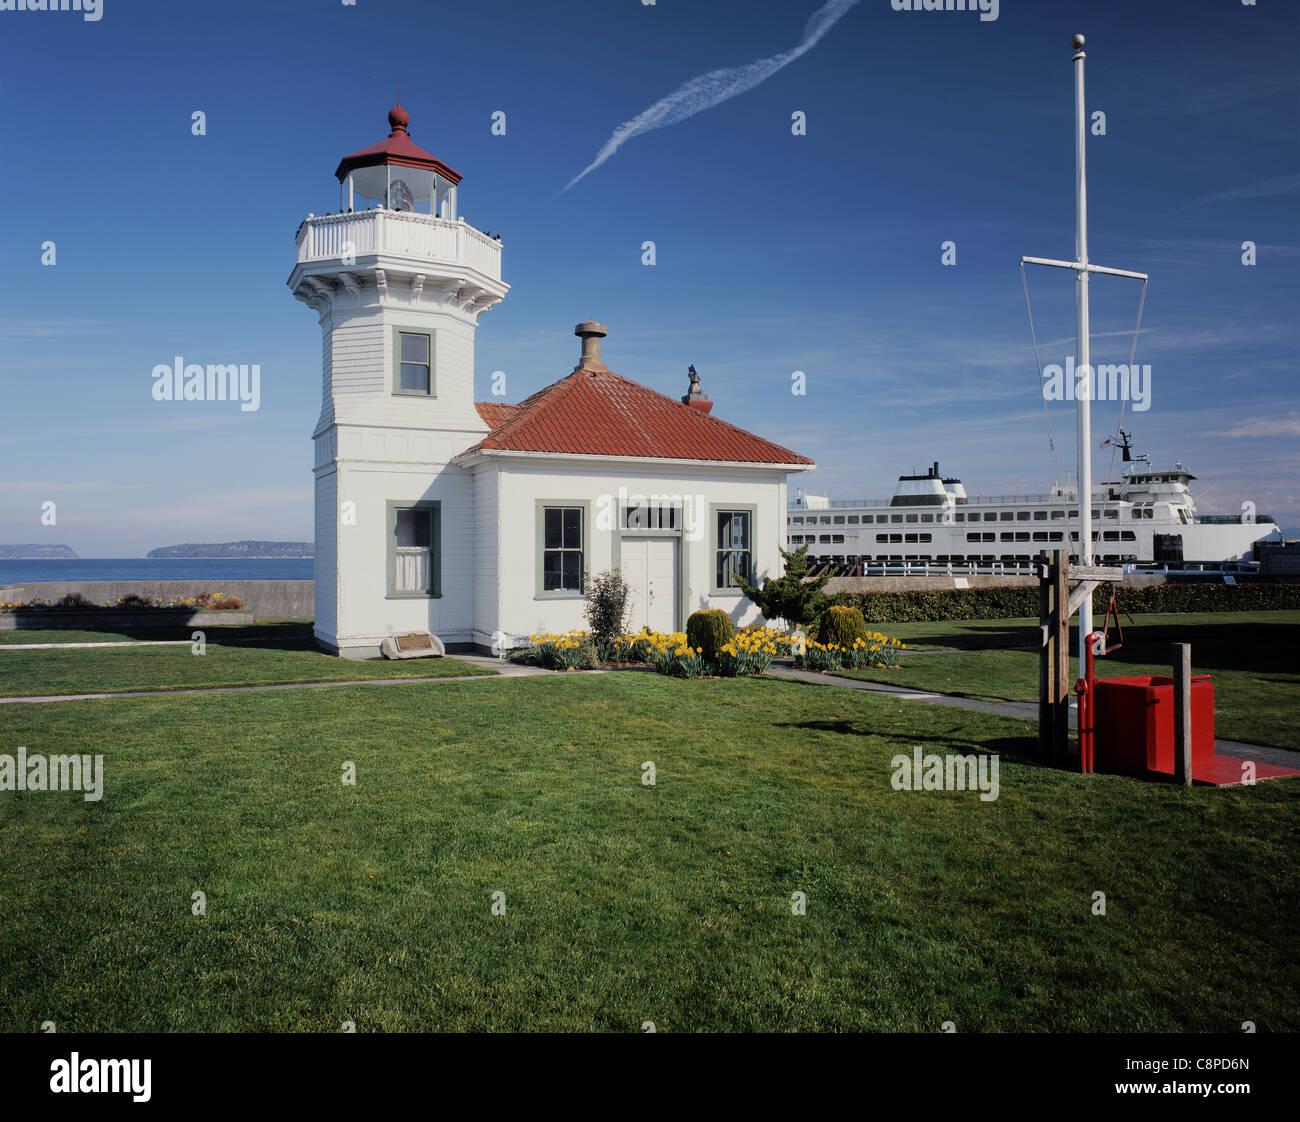 AA05940-01....WASHINGTON - Mukilteo Lighthouse on Possession Sound at Mukilteo. - Stock Image